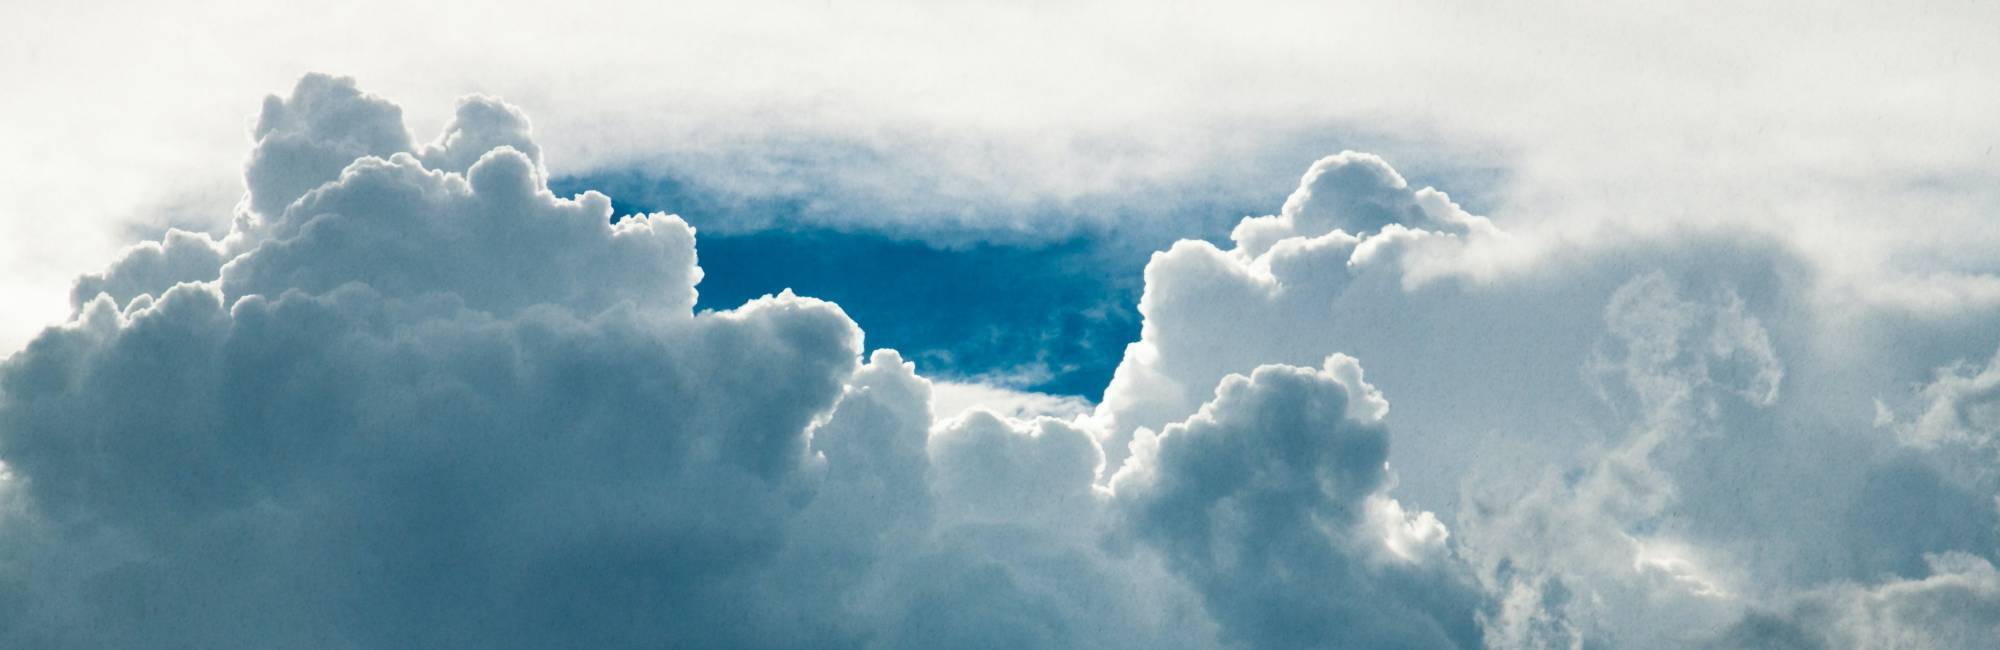 Clouds. Photo: Marc Wieland on Unsplash